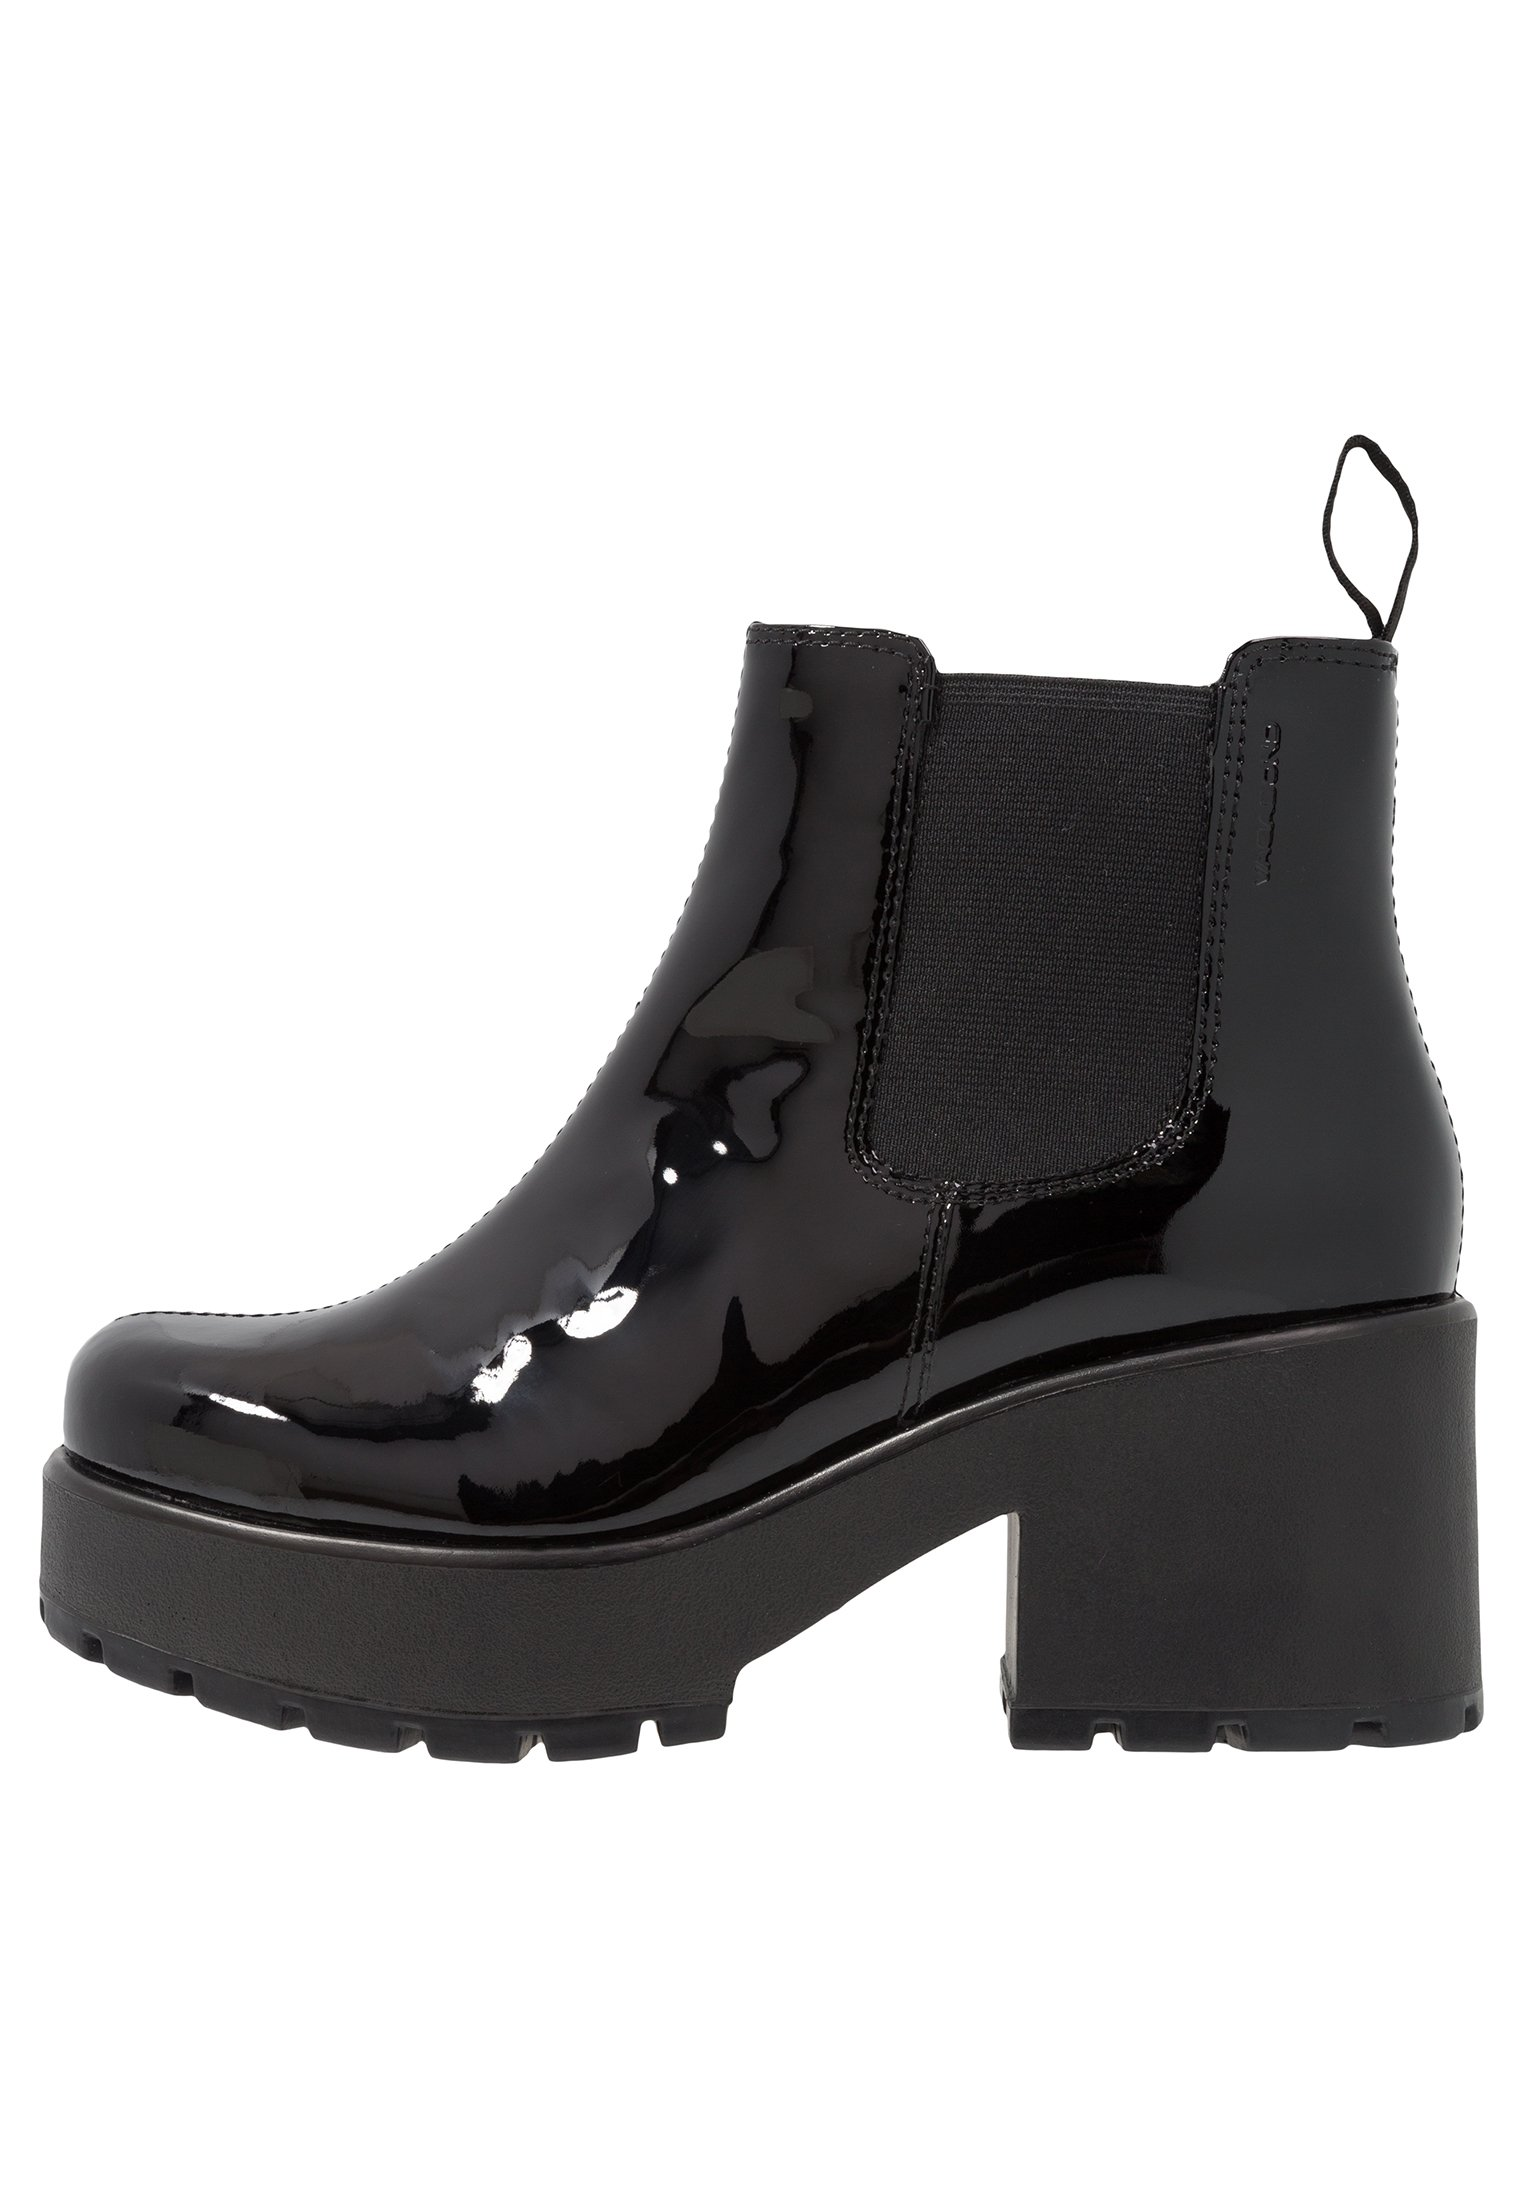 Vagabond DIOON Korte laarzen black Zalando.nl